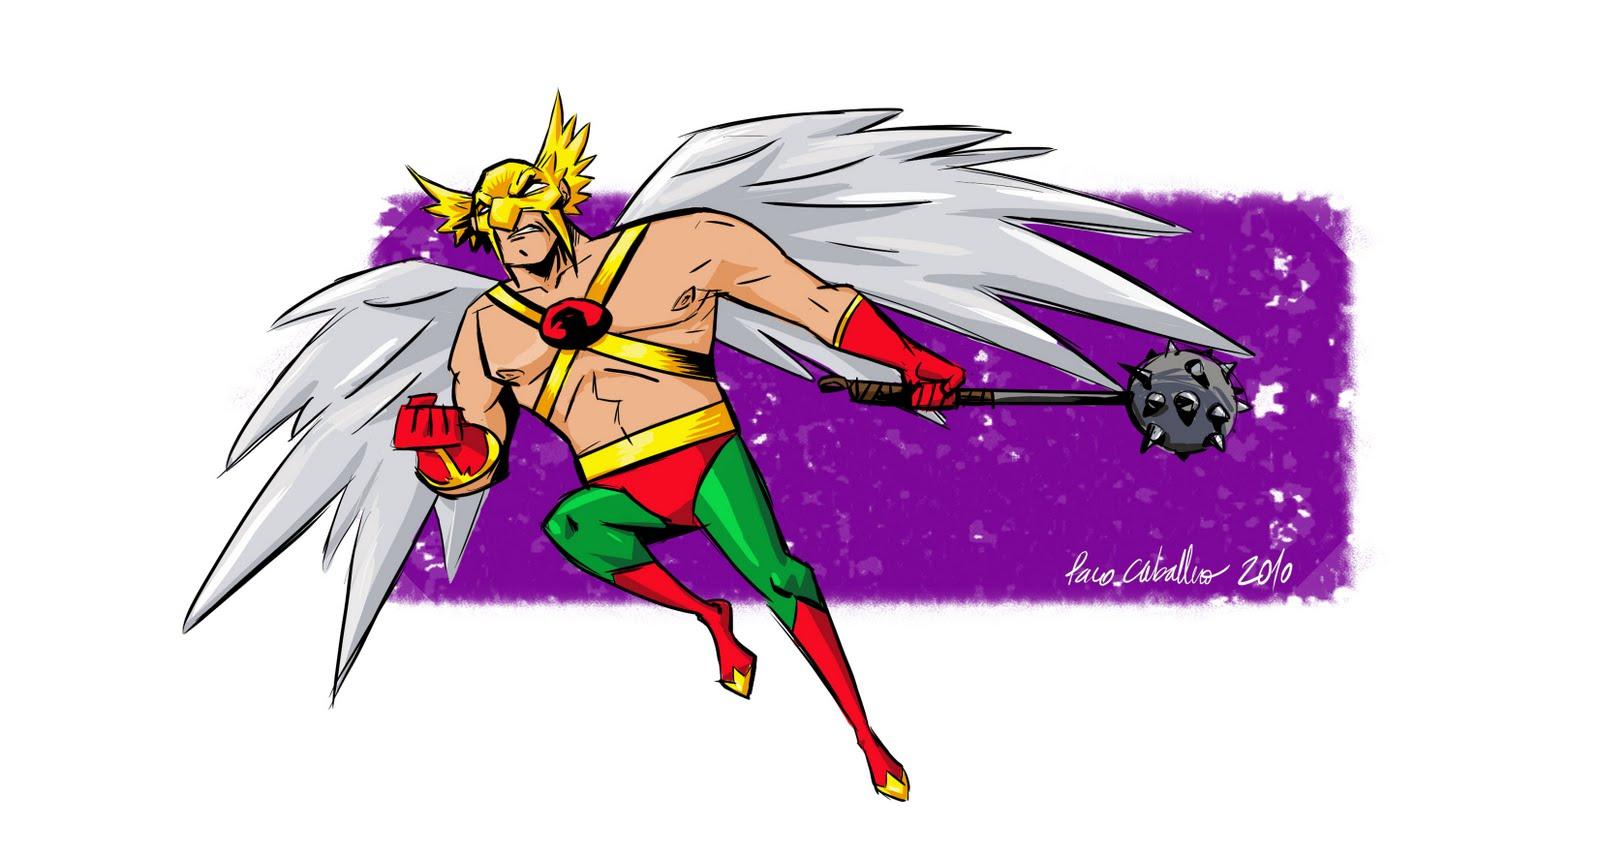 Hawkman paco caballero - Paco caballero ...